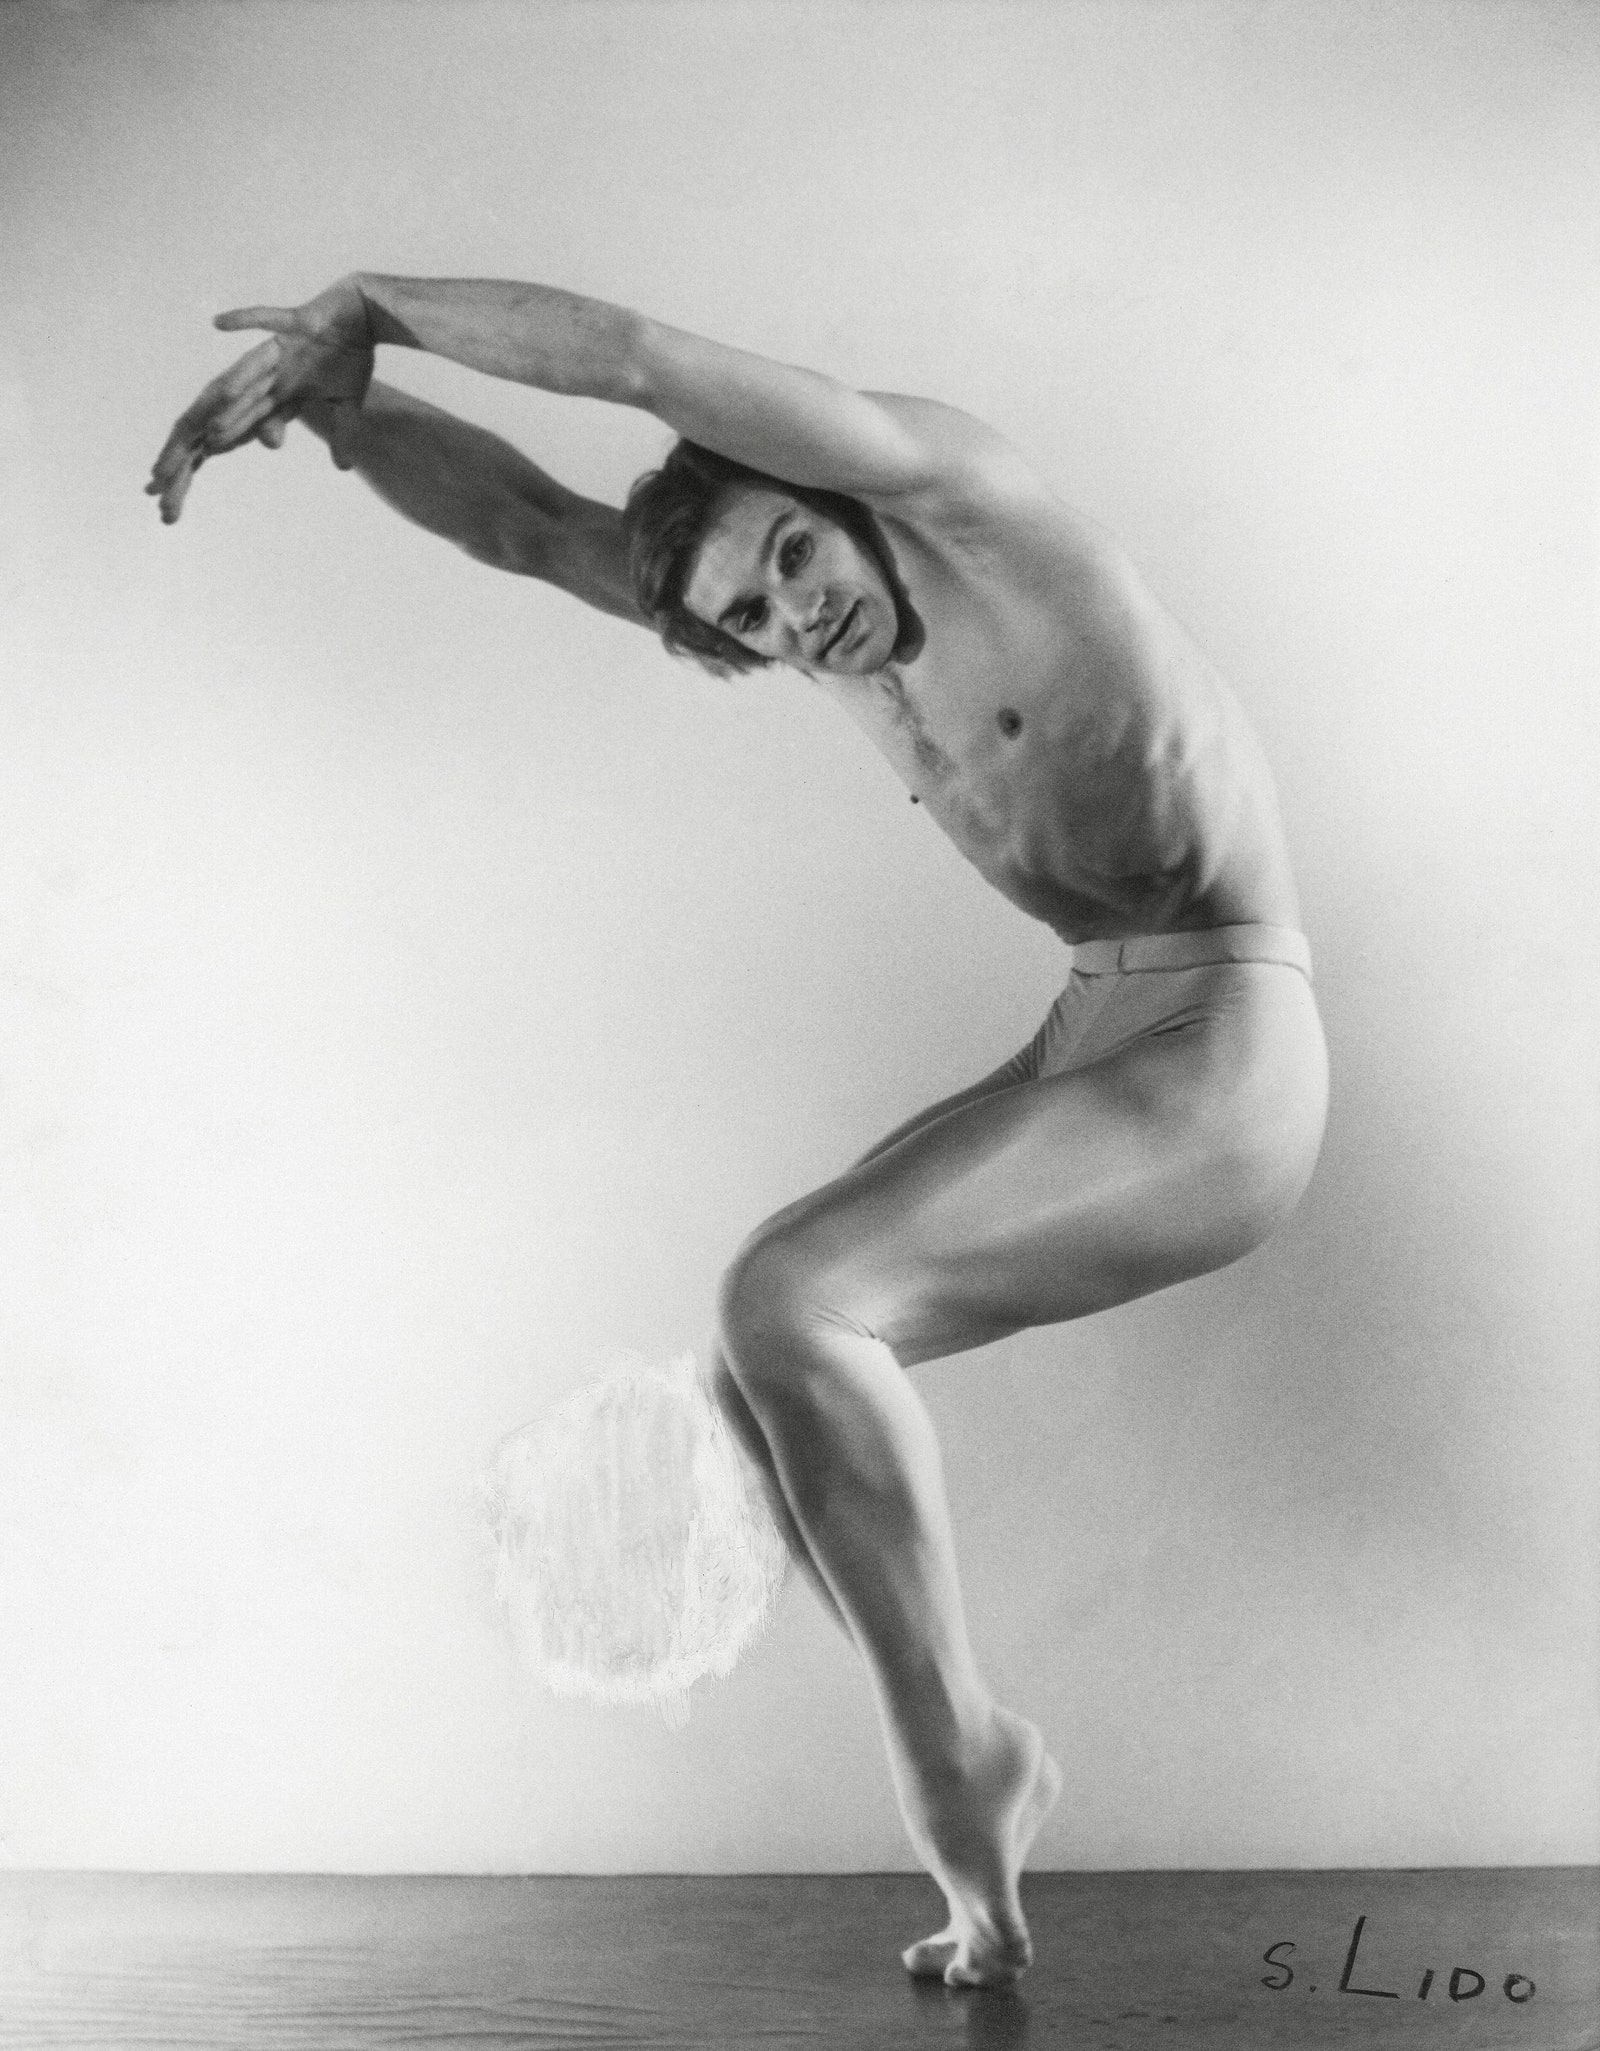 Serge Lido Photography. Vladimir Vassiliev Narcisse Etude Photografique de Serge Lido. Paris 1977 . Silver Gelatine Print.